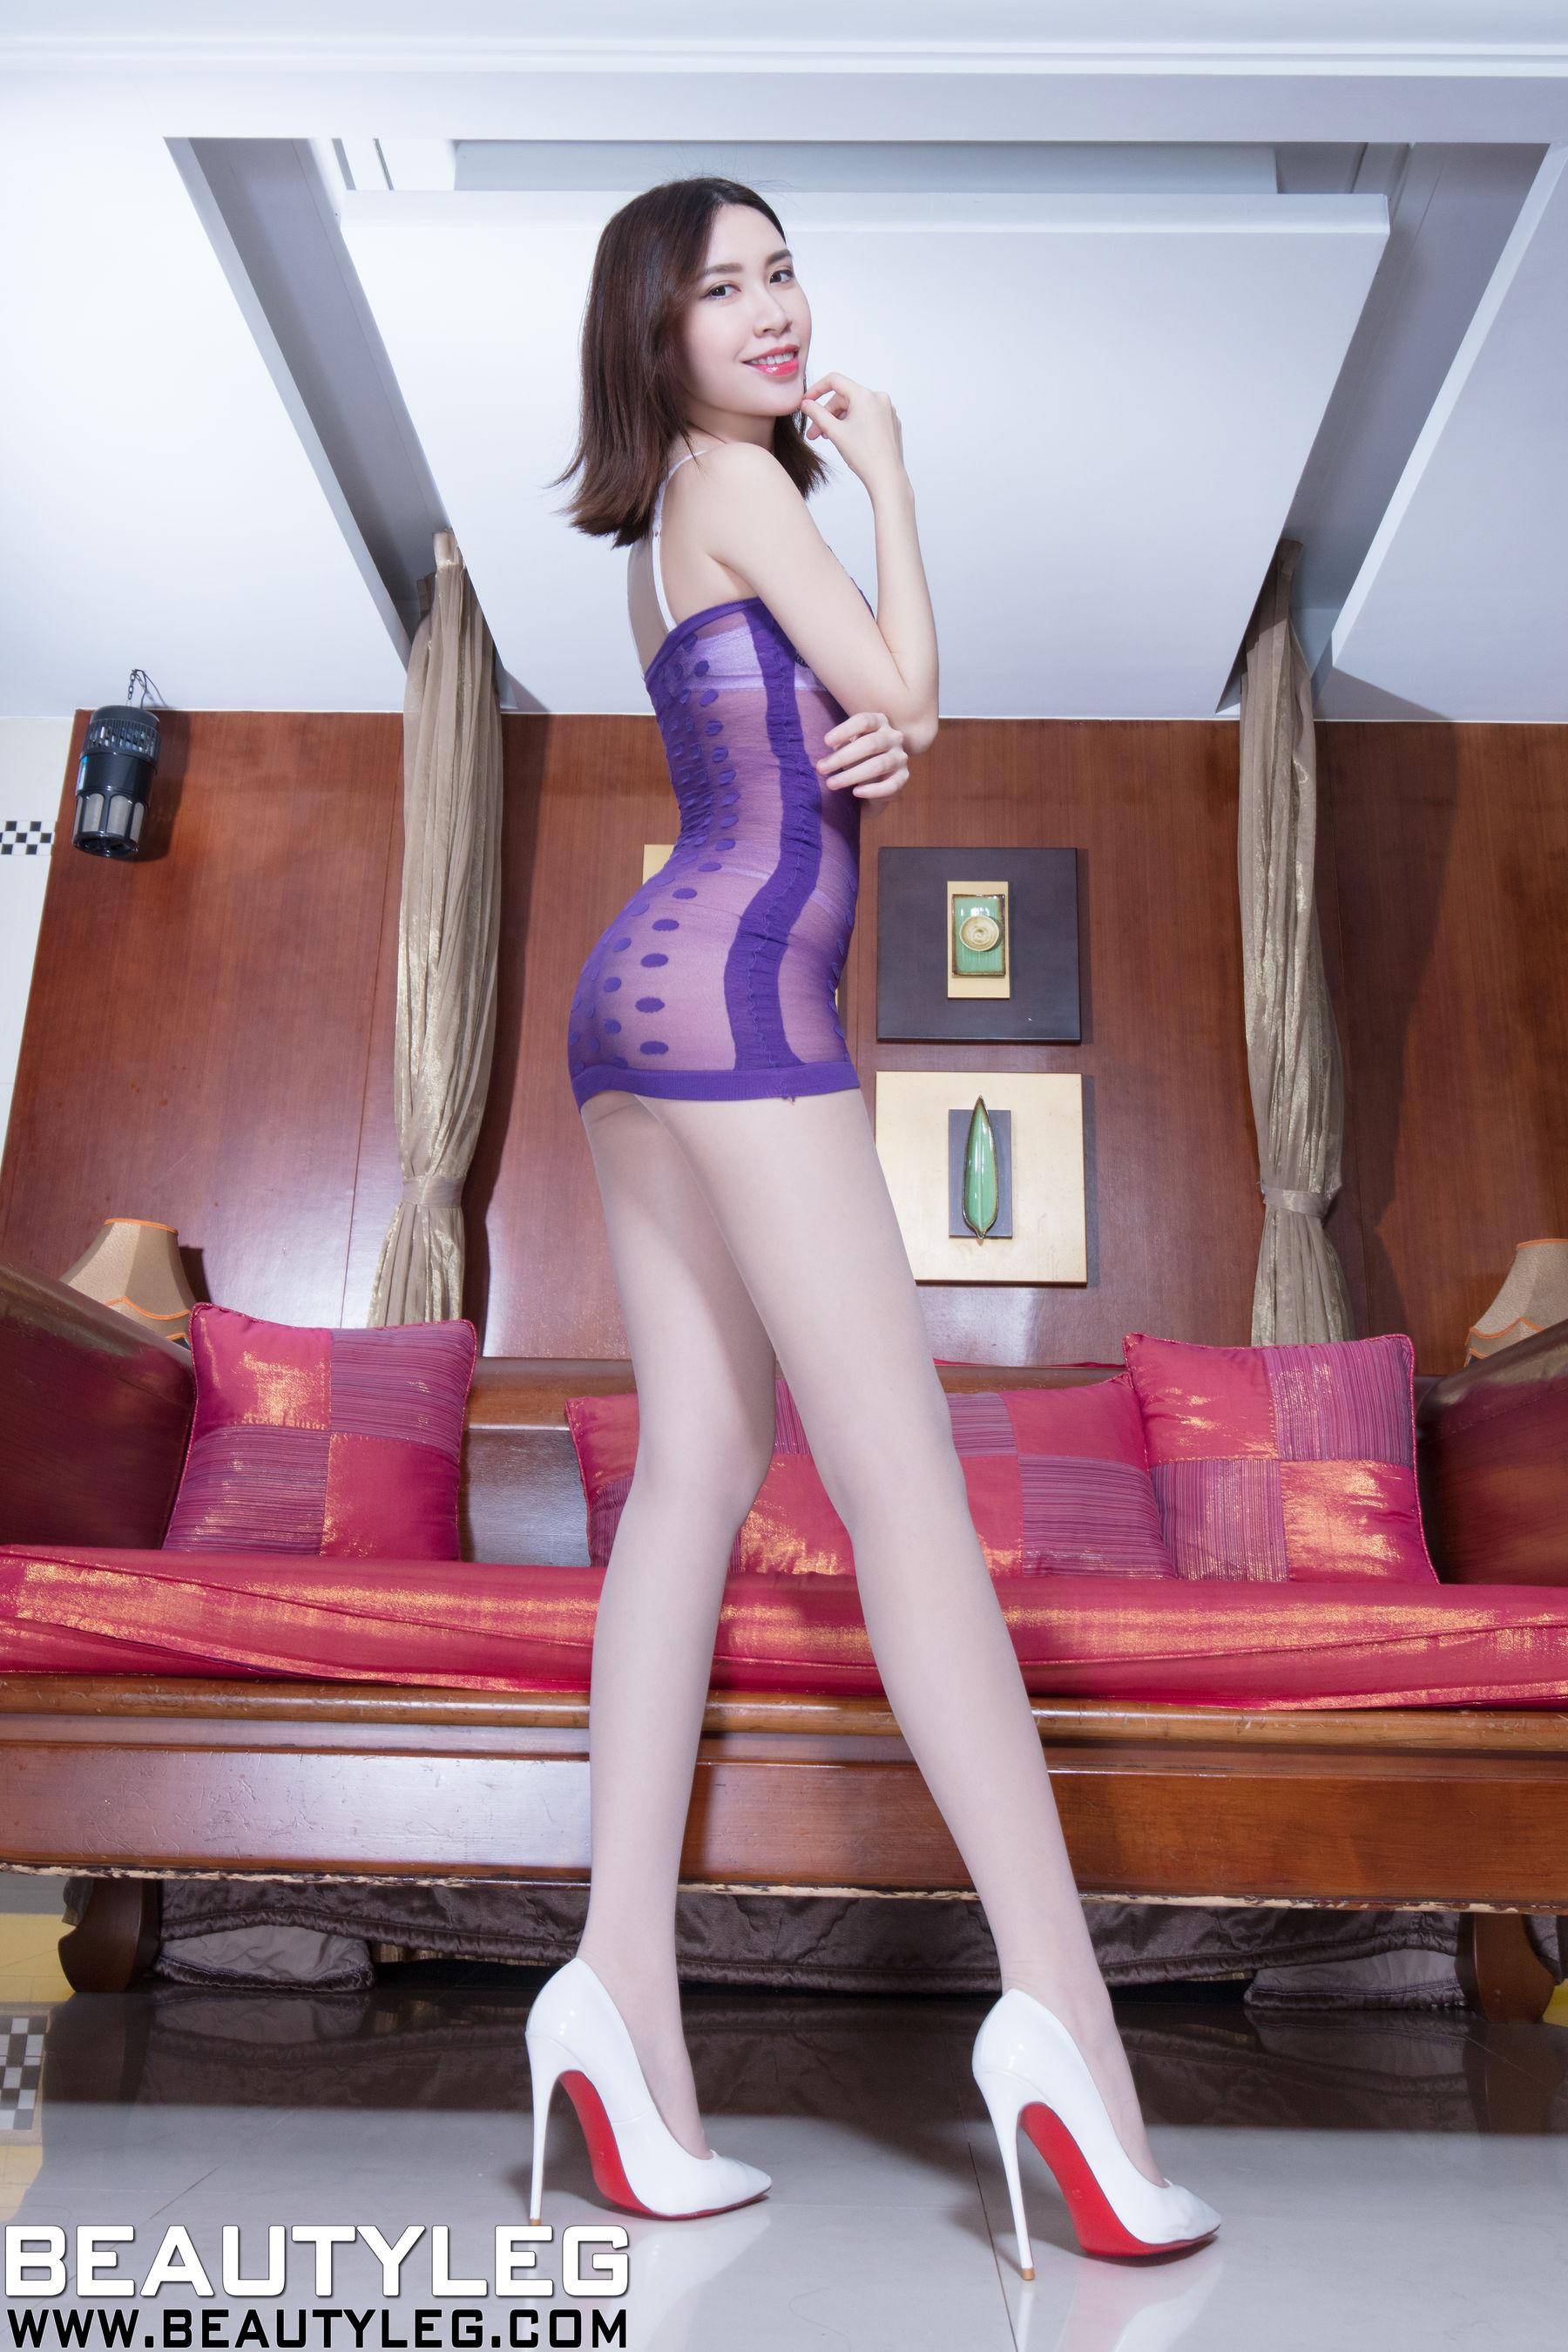 VOL.1466 [Beautyleg]丝袜美腿内衣美女长腿美女:崔多朵(崔德蓉,腿模Stephy)超高清个人性感漂亮大图(56P)